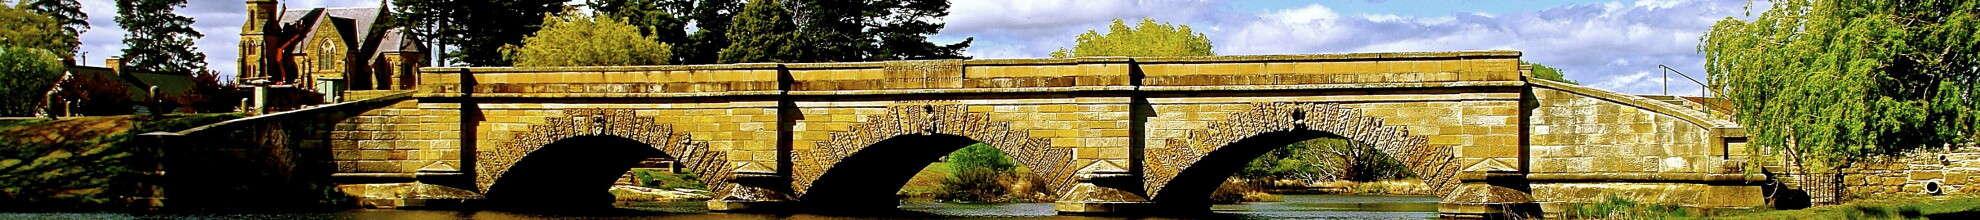 sandstone bridge in Ross Tasmania with church in background